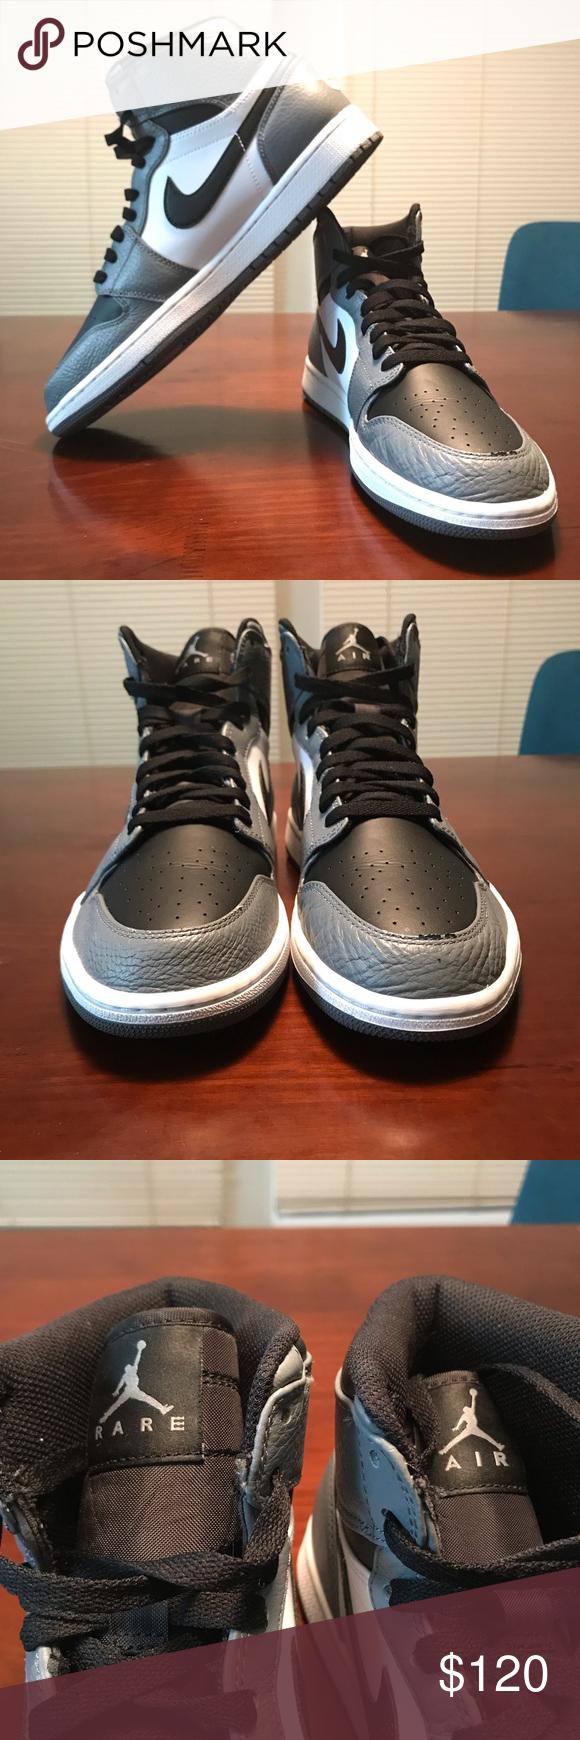 "c8d5eb0f0300ea 🔥Air Jordan 1 High Rare Air ""Cool Grey""-11🔥 Air Jordan 1 High Rare ..."